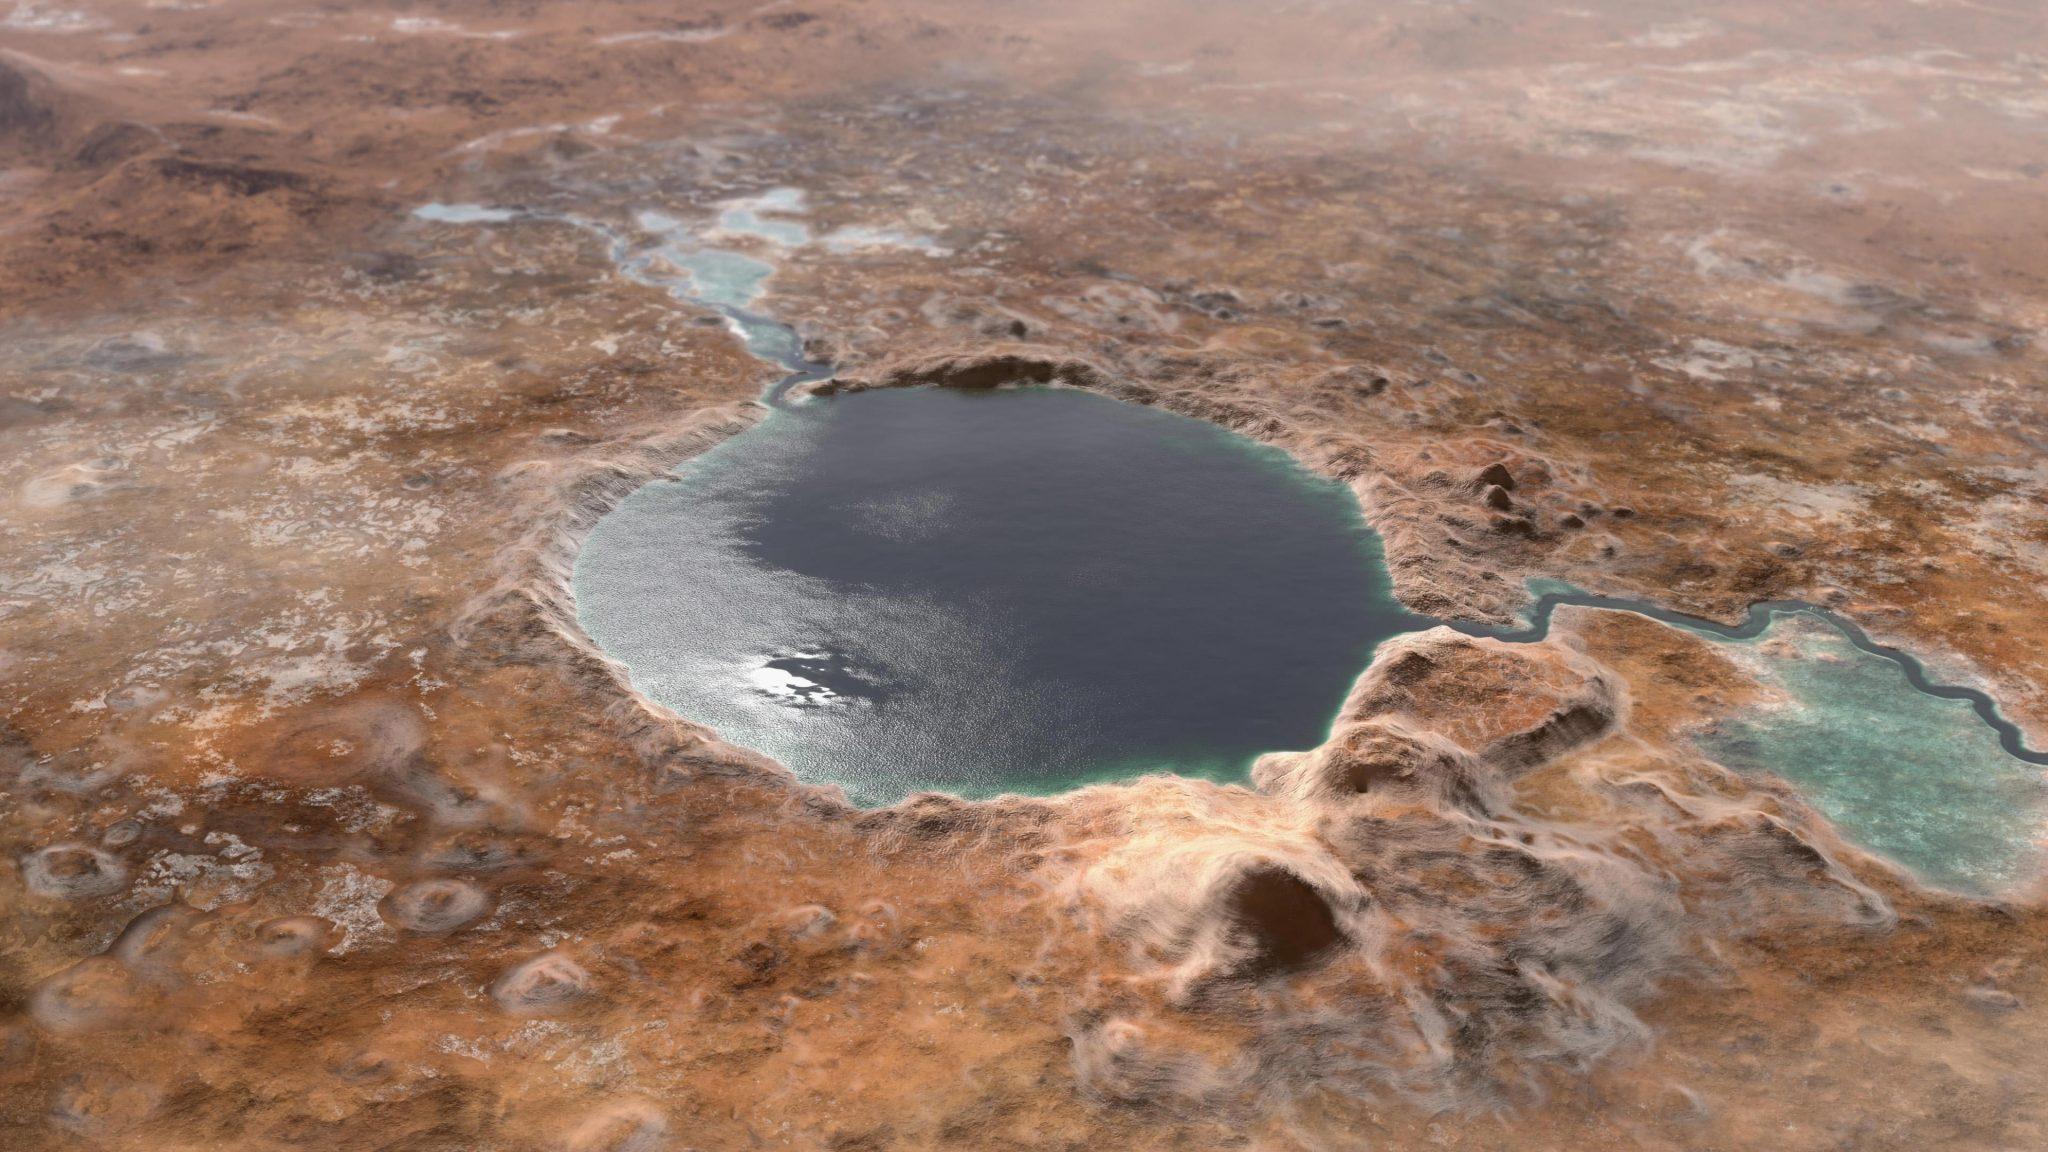 mars-jezero-crater-lake-20x1152-1.jpg (368.38 Kb)